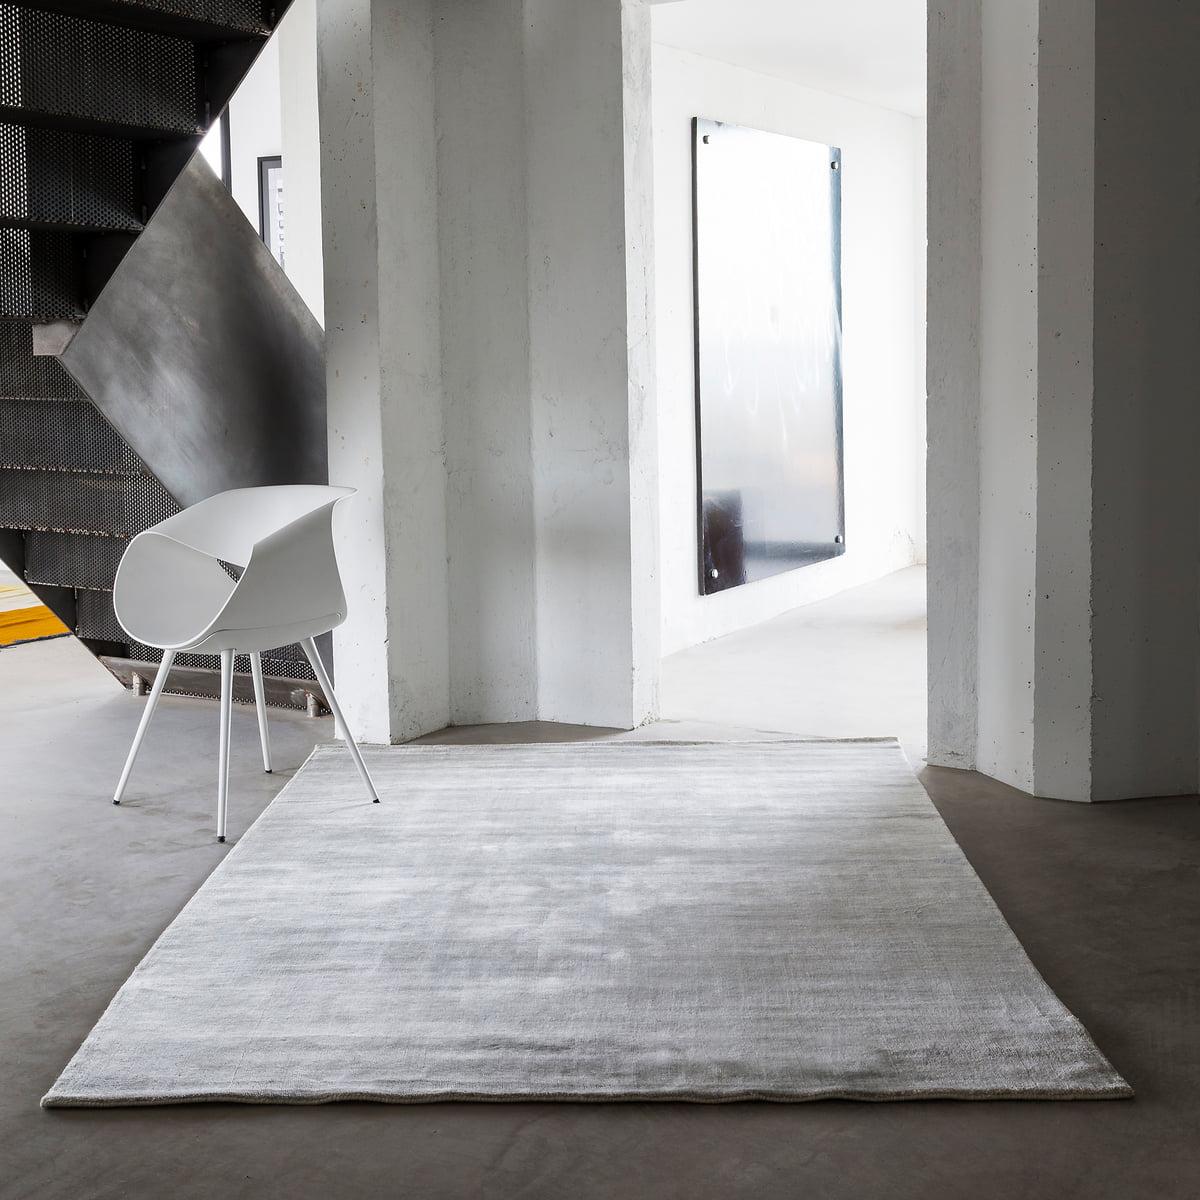 bamboo teppich von massimo connox. Black Bedroom Furniture Sets. Home Design Ideas